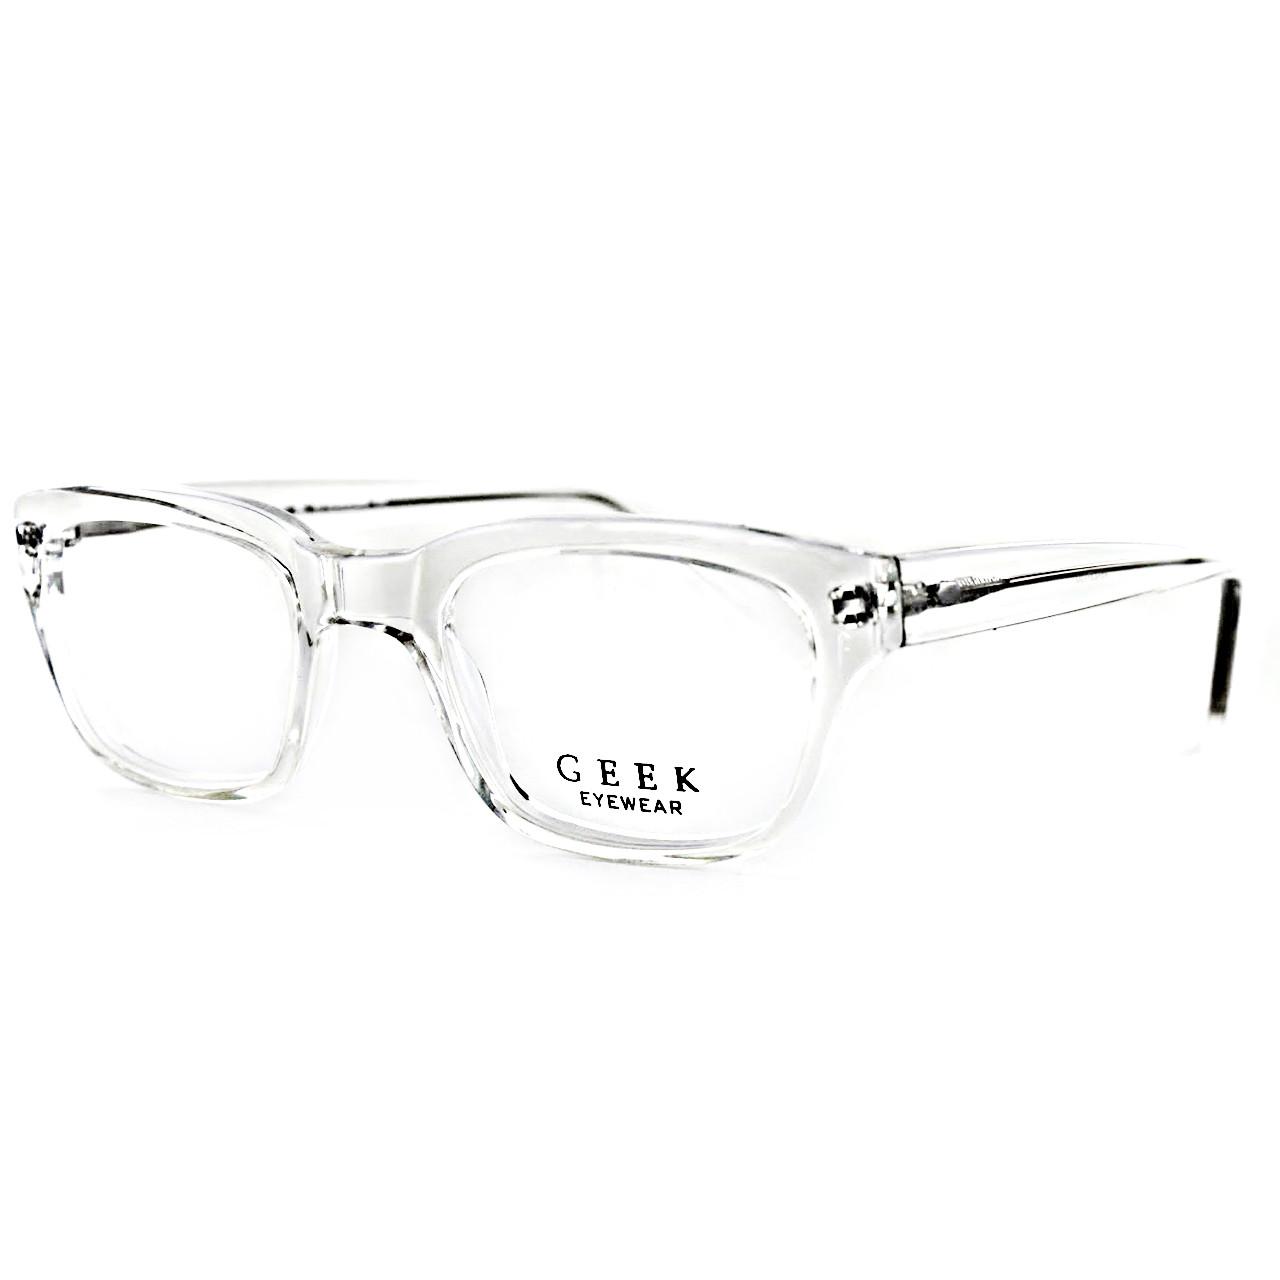 GEEK Eyewear GEEK 122